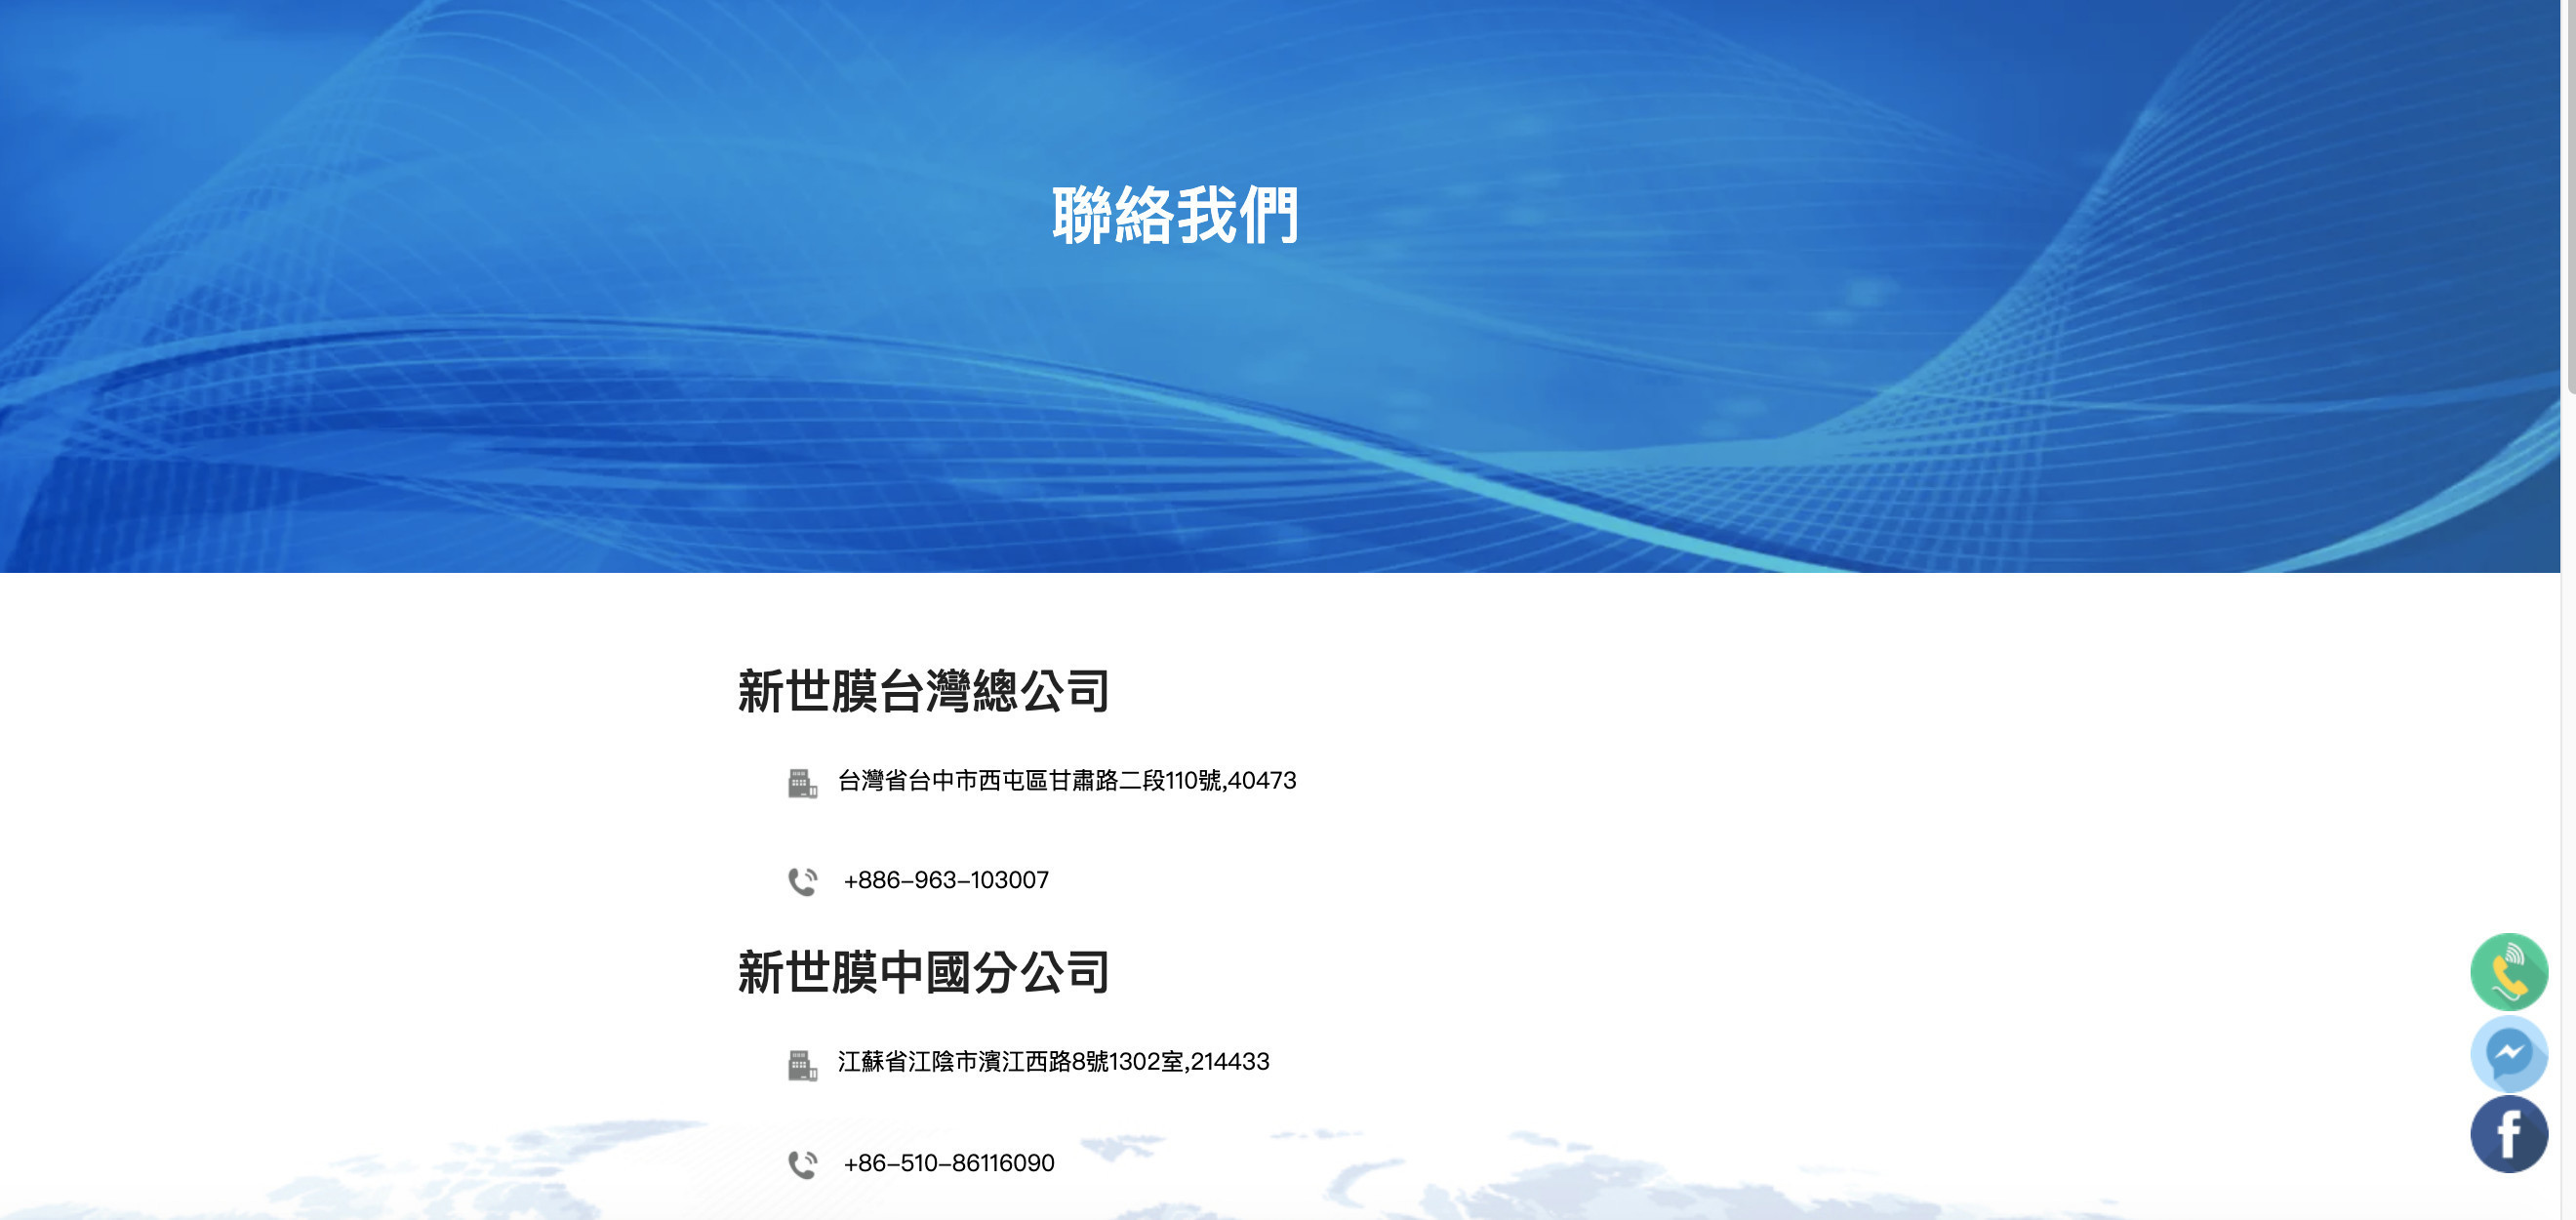 SEO網頁設計成功案例-ThinksMore新世膜社群按鈕